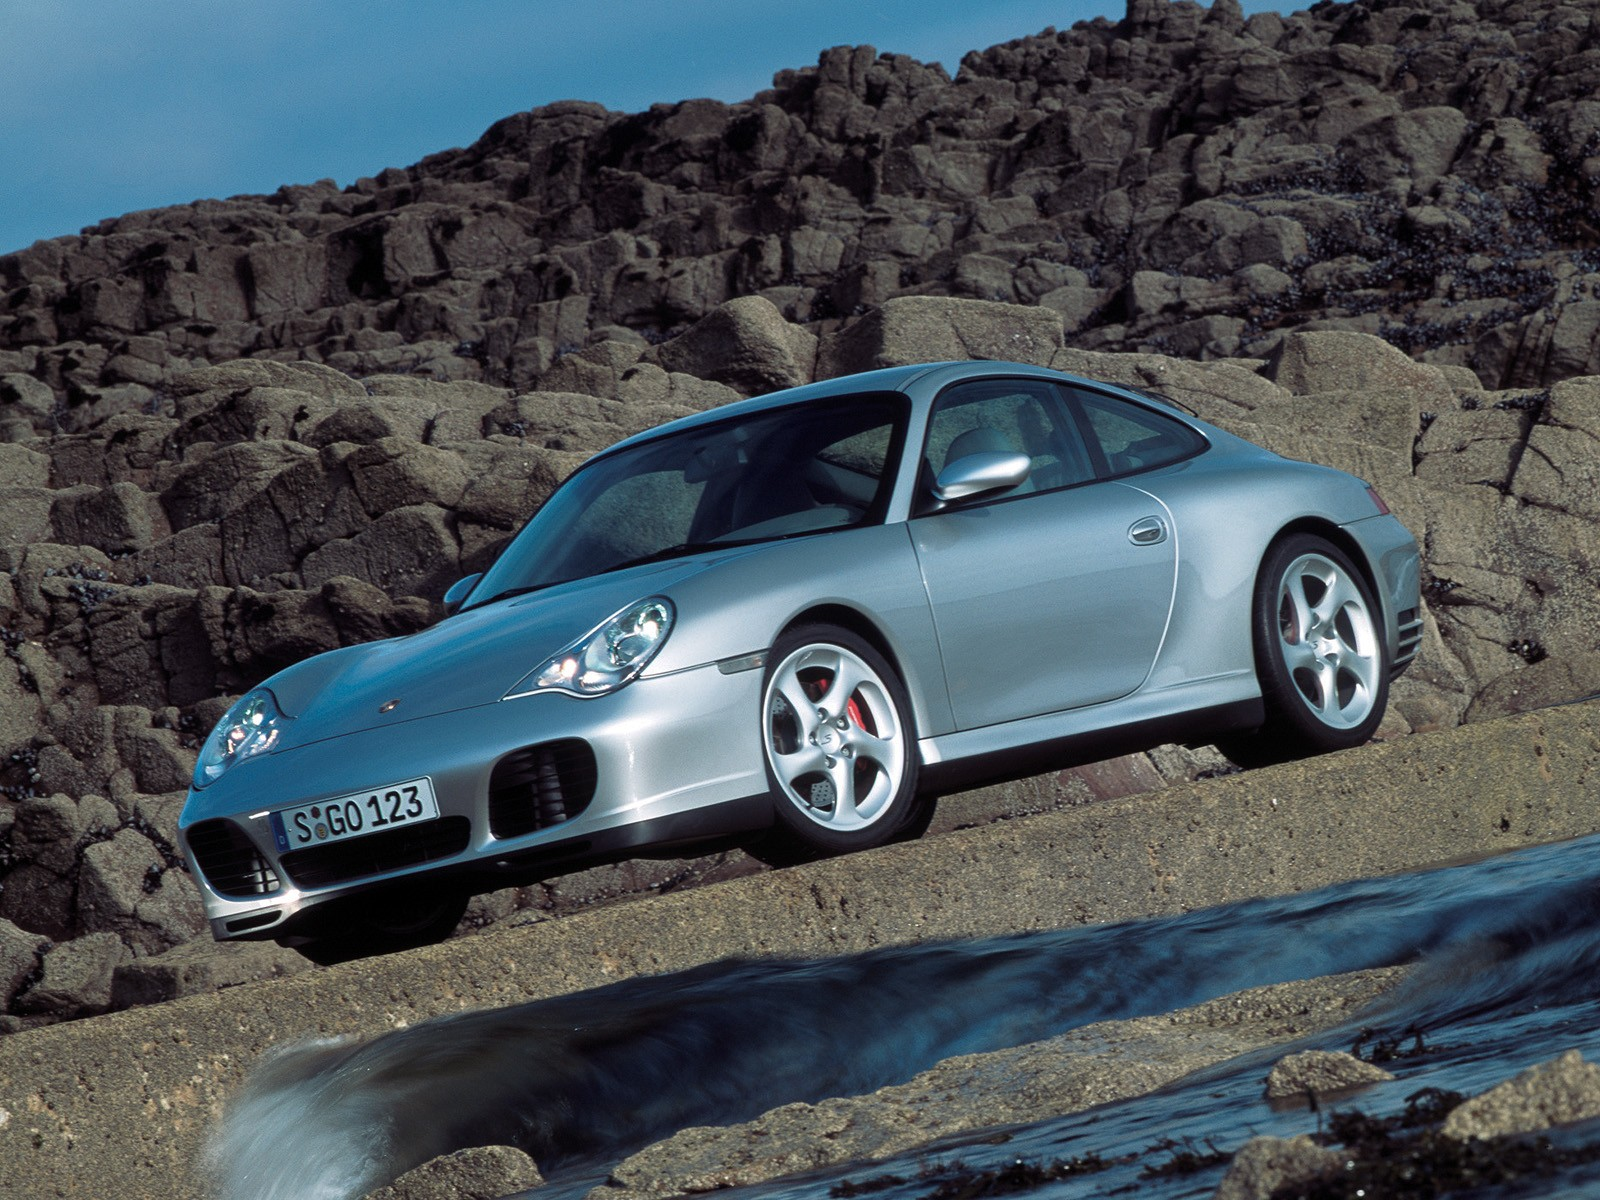 Porsche 911 4s >> PORSCHE 911 Carrera 4S (996) specs - 2001, 2002, 2003, 2004, 2005 - autoevolution